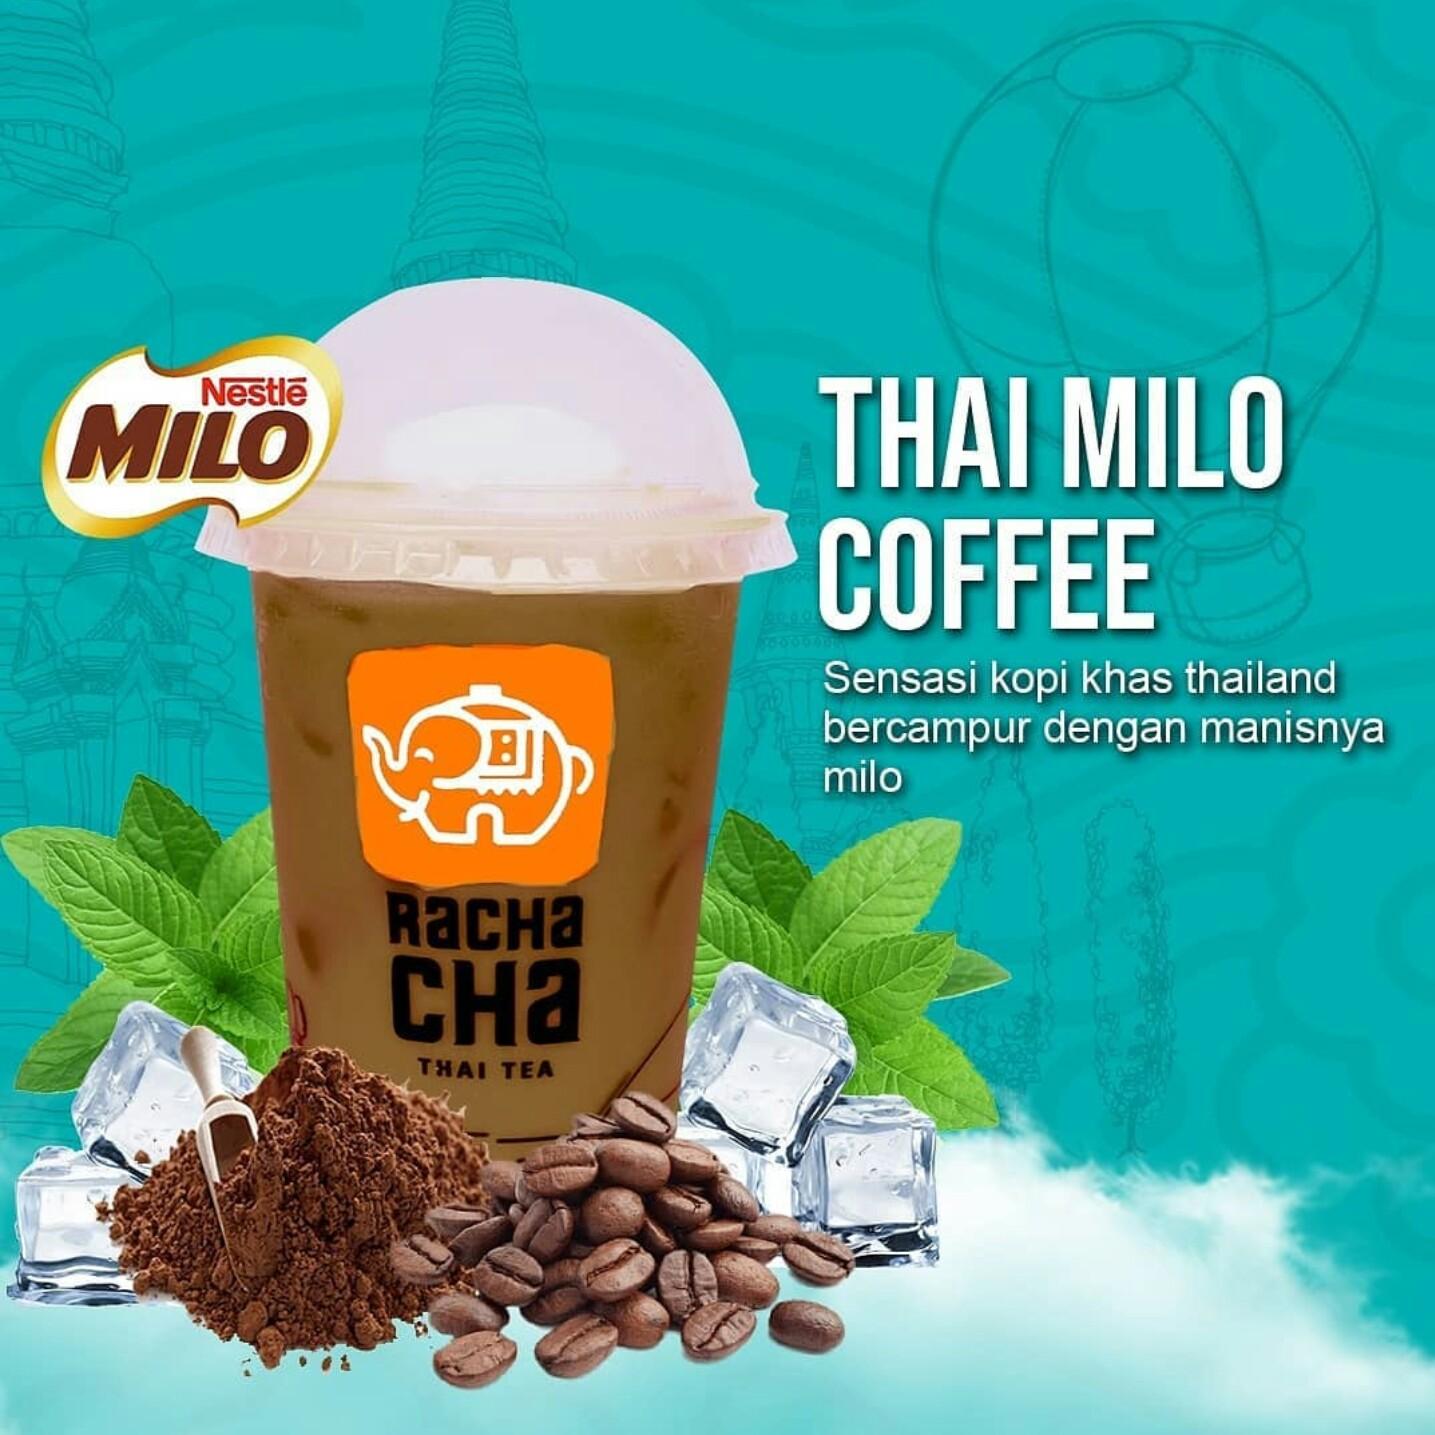 Racha Cha Thai Tea Koja Makanan Delivery Menu Grabfood